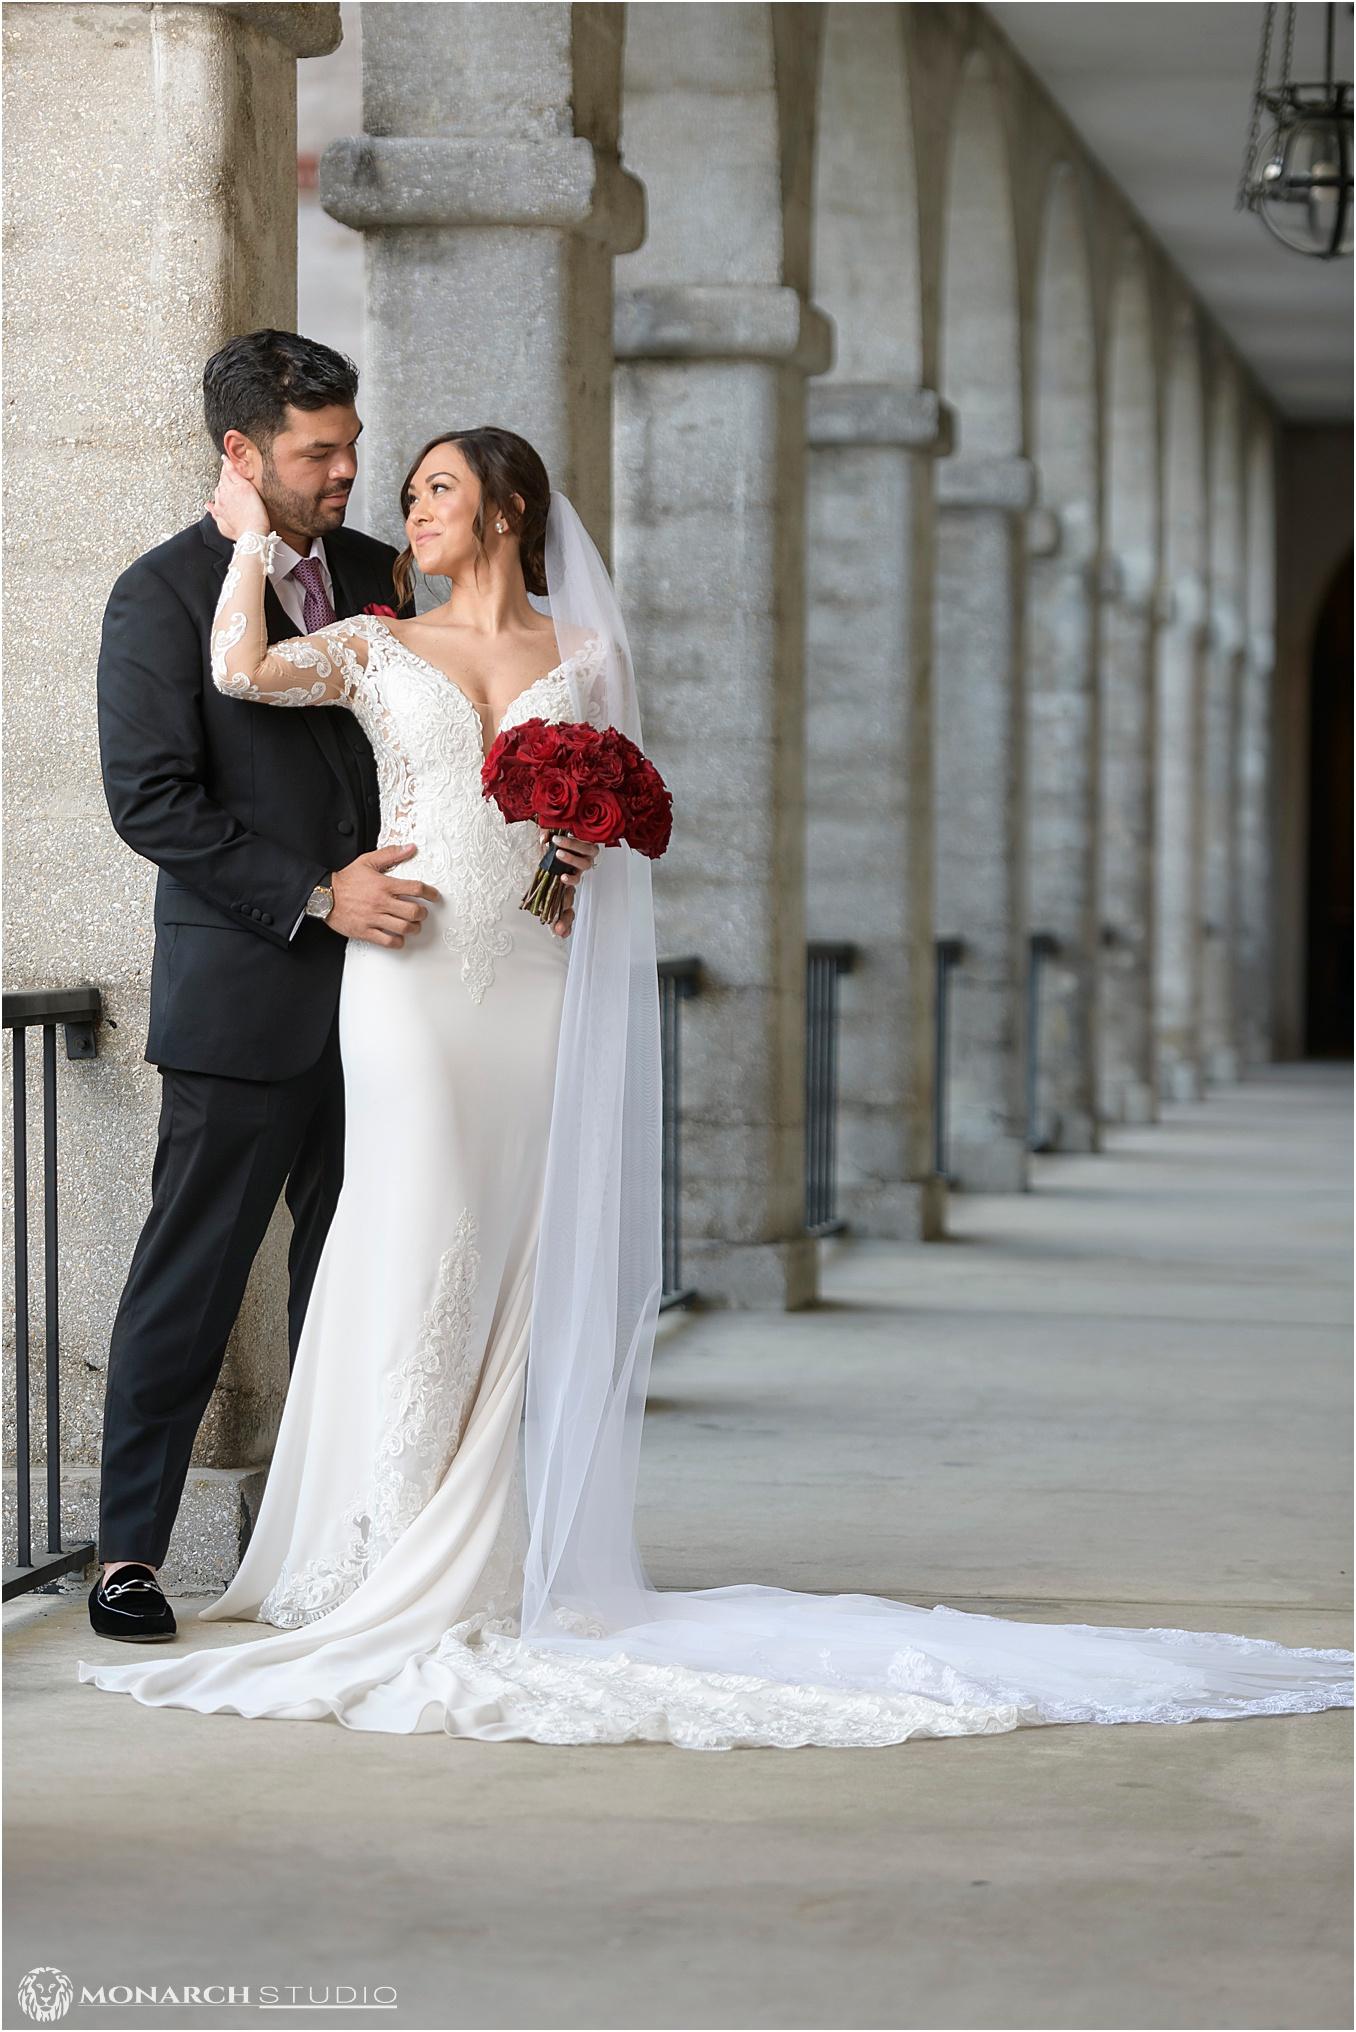 st-augustine-high-end-wedding-photographers-091.jpg